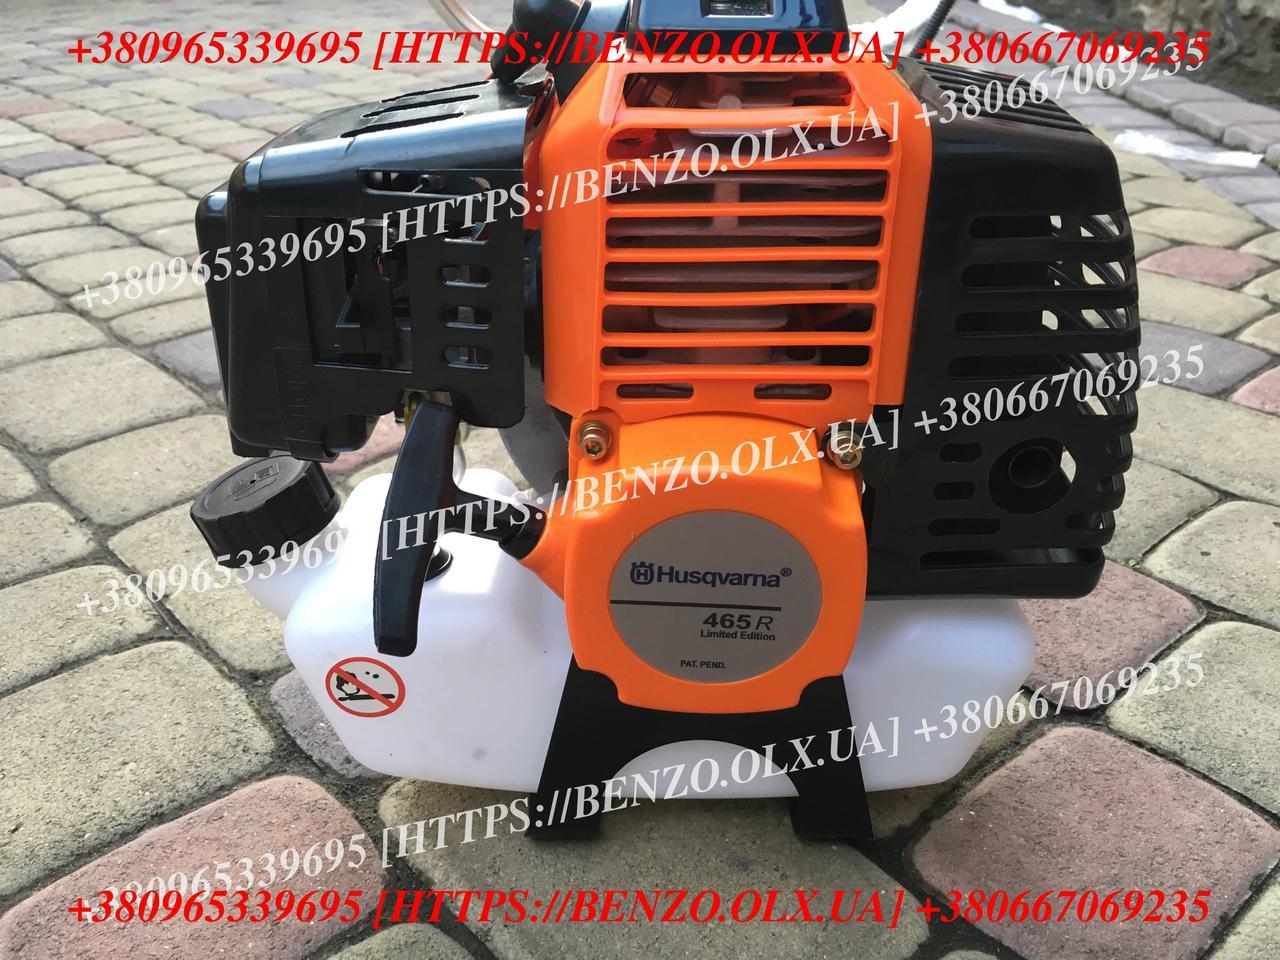 Бензокоса Тример Мотокоса Кусторез Husqvarna 465 Limited Edition